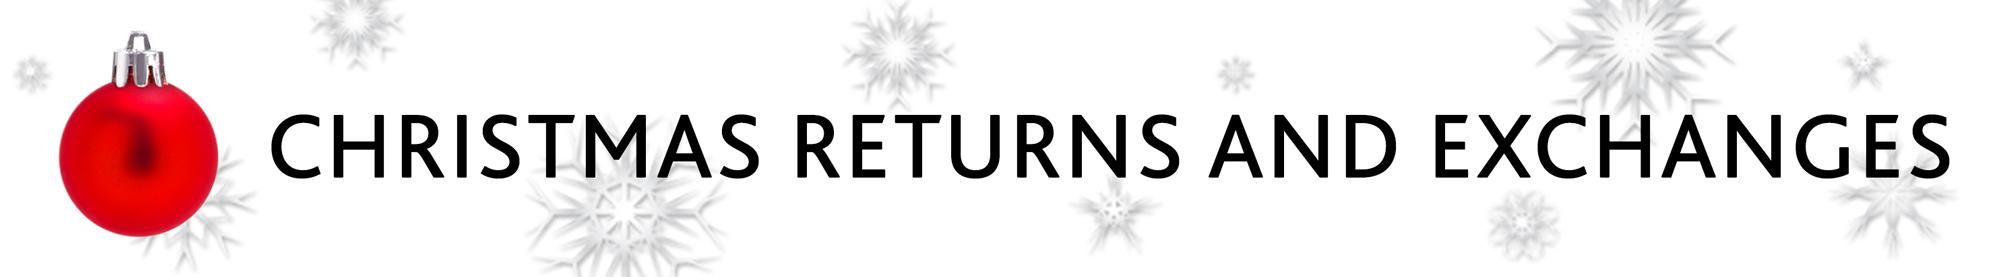 xmas-returns.jpg